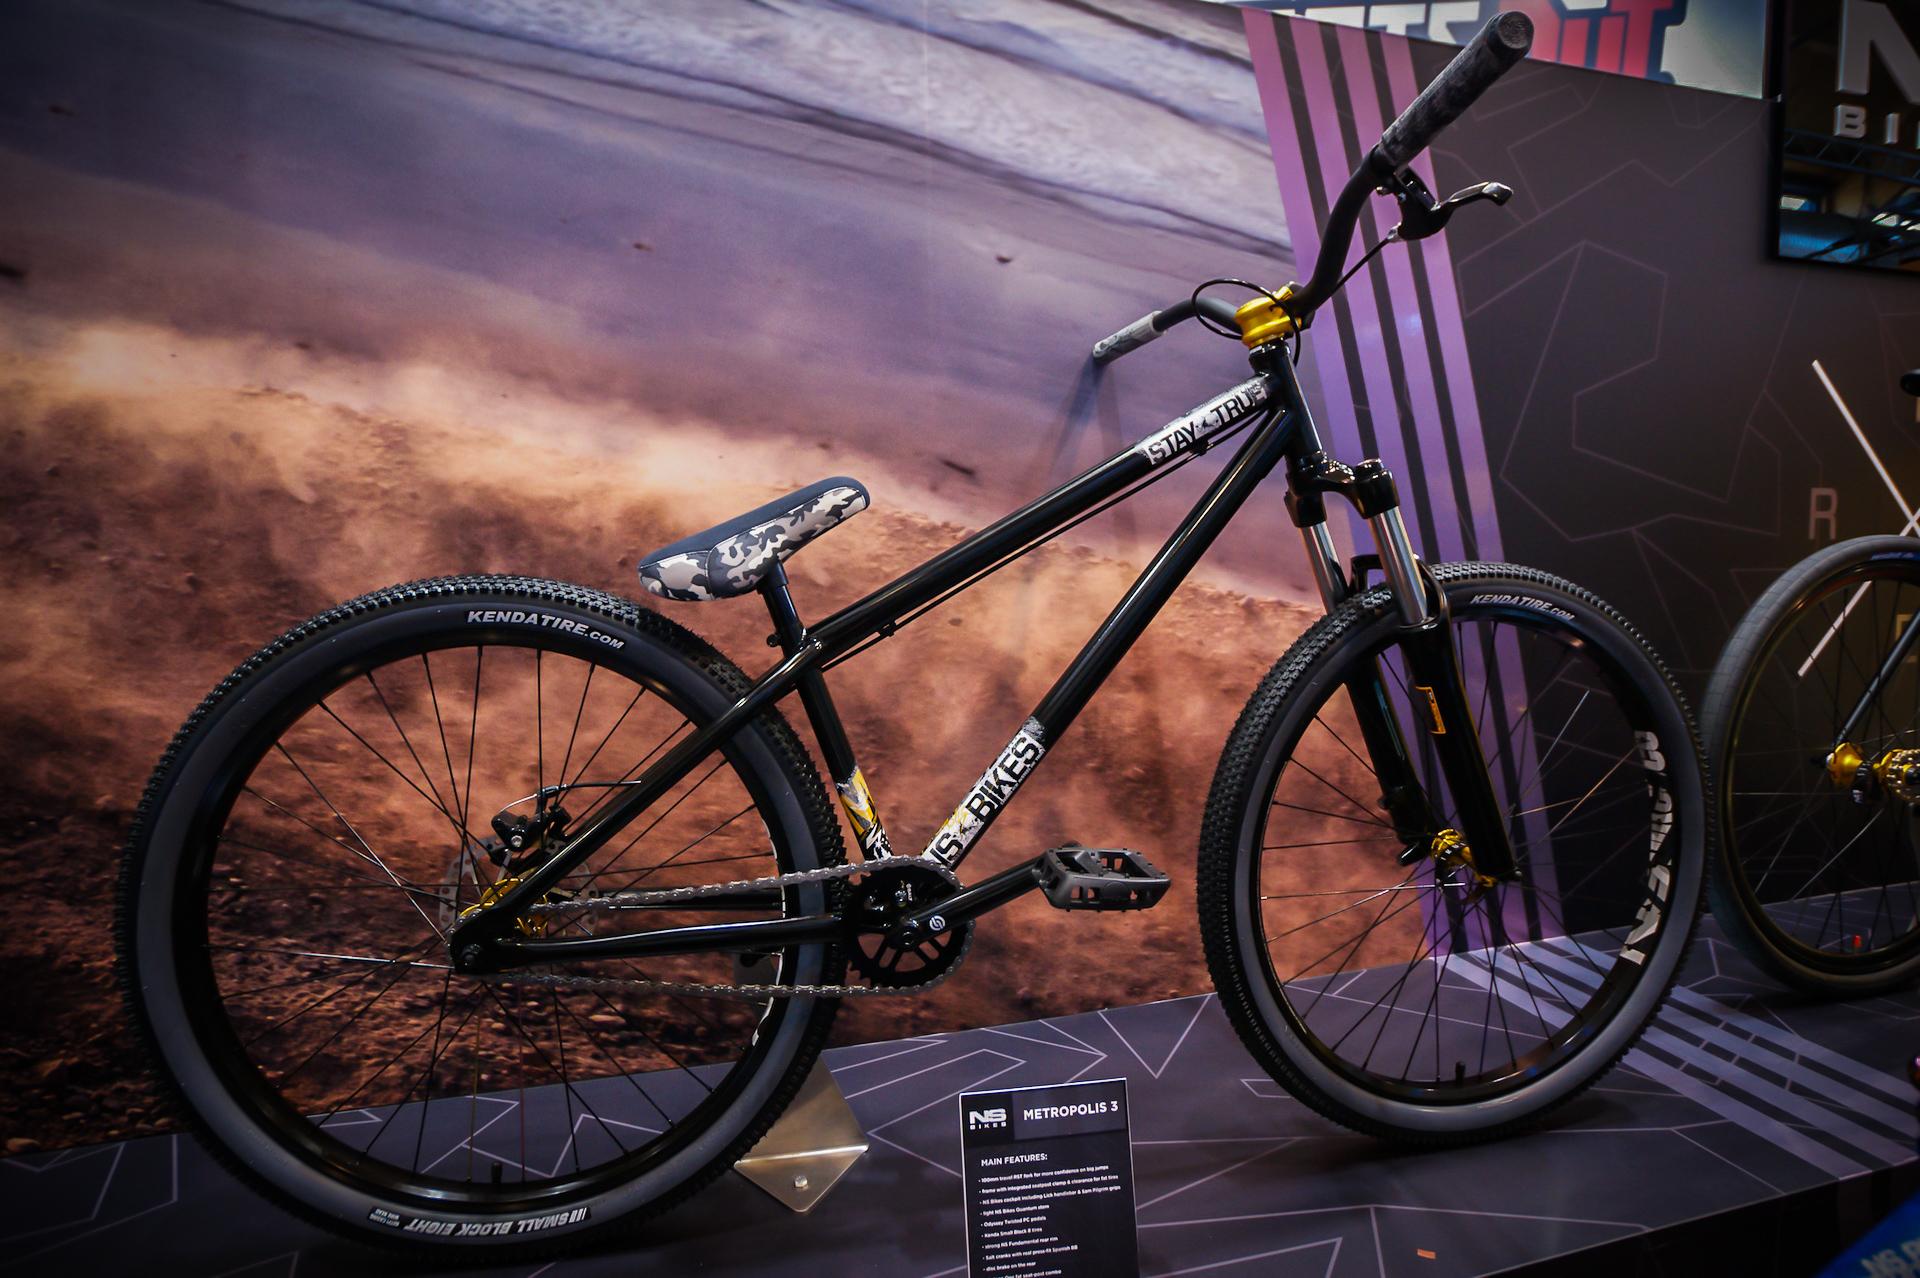 Dirtowy NS Bikes Metropolis 3.